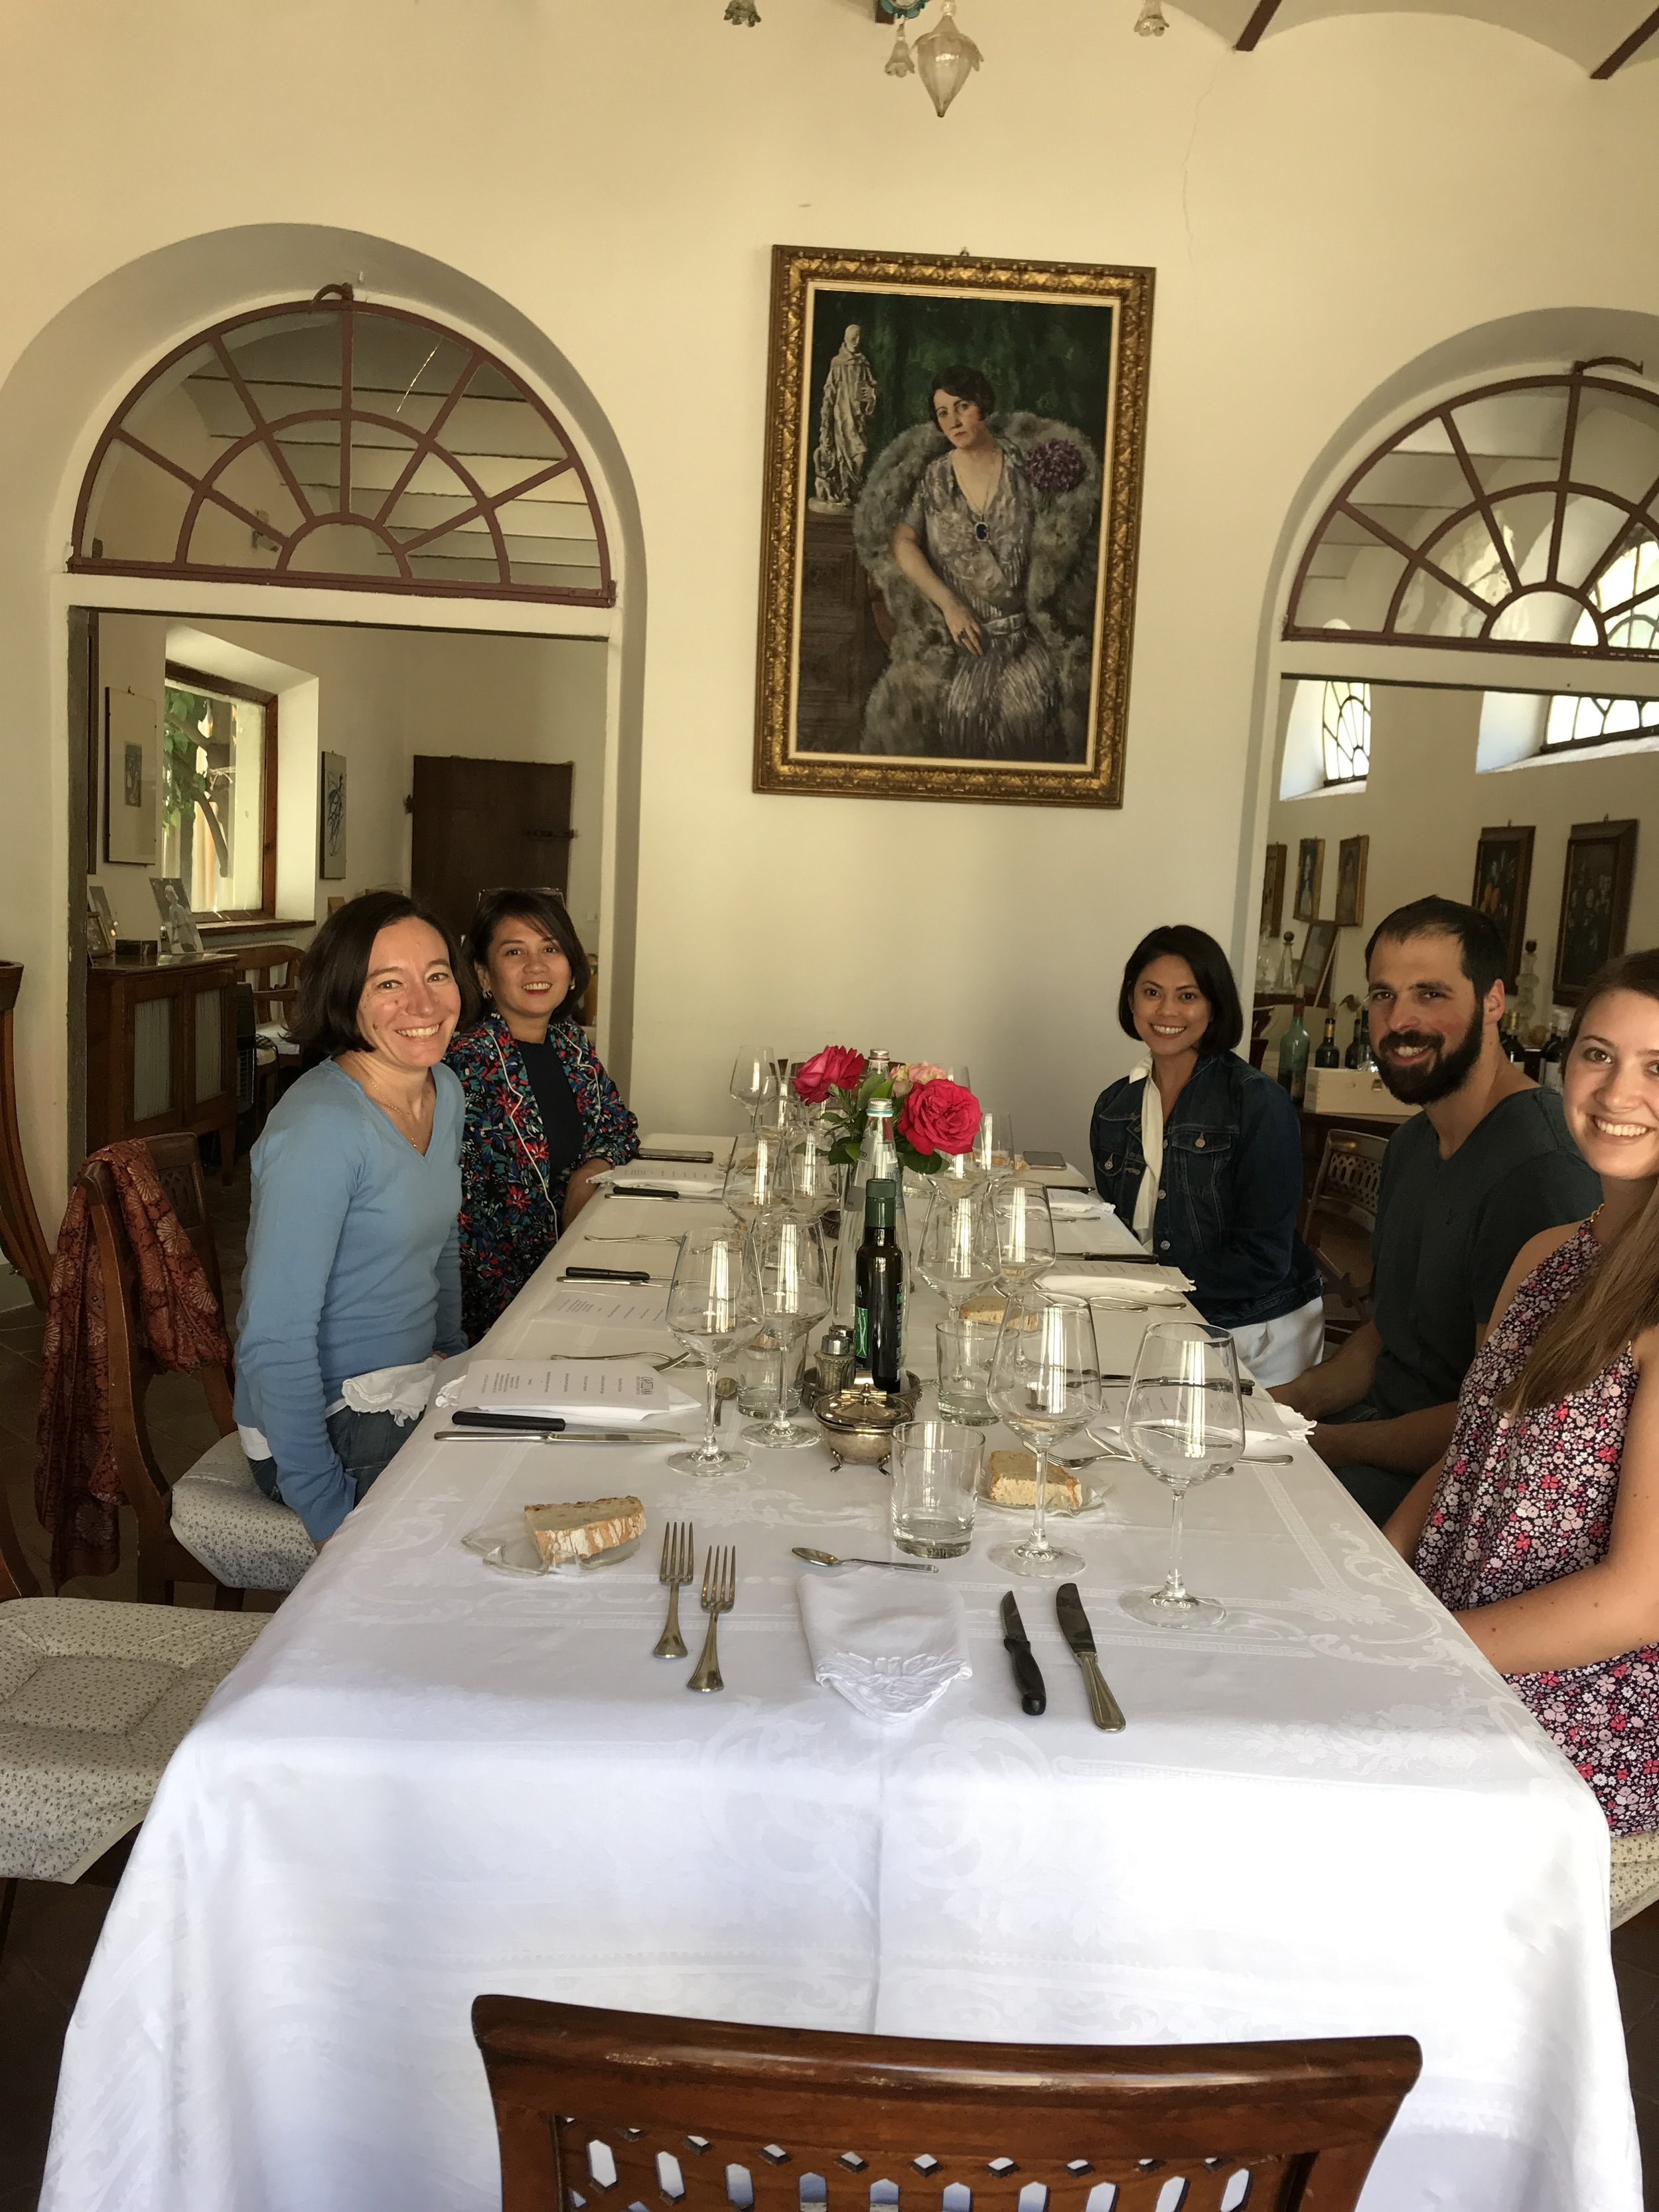 Lunch with our host, Serena Contini Bonacossi.